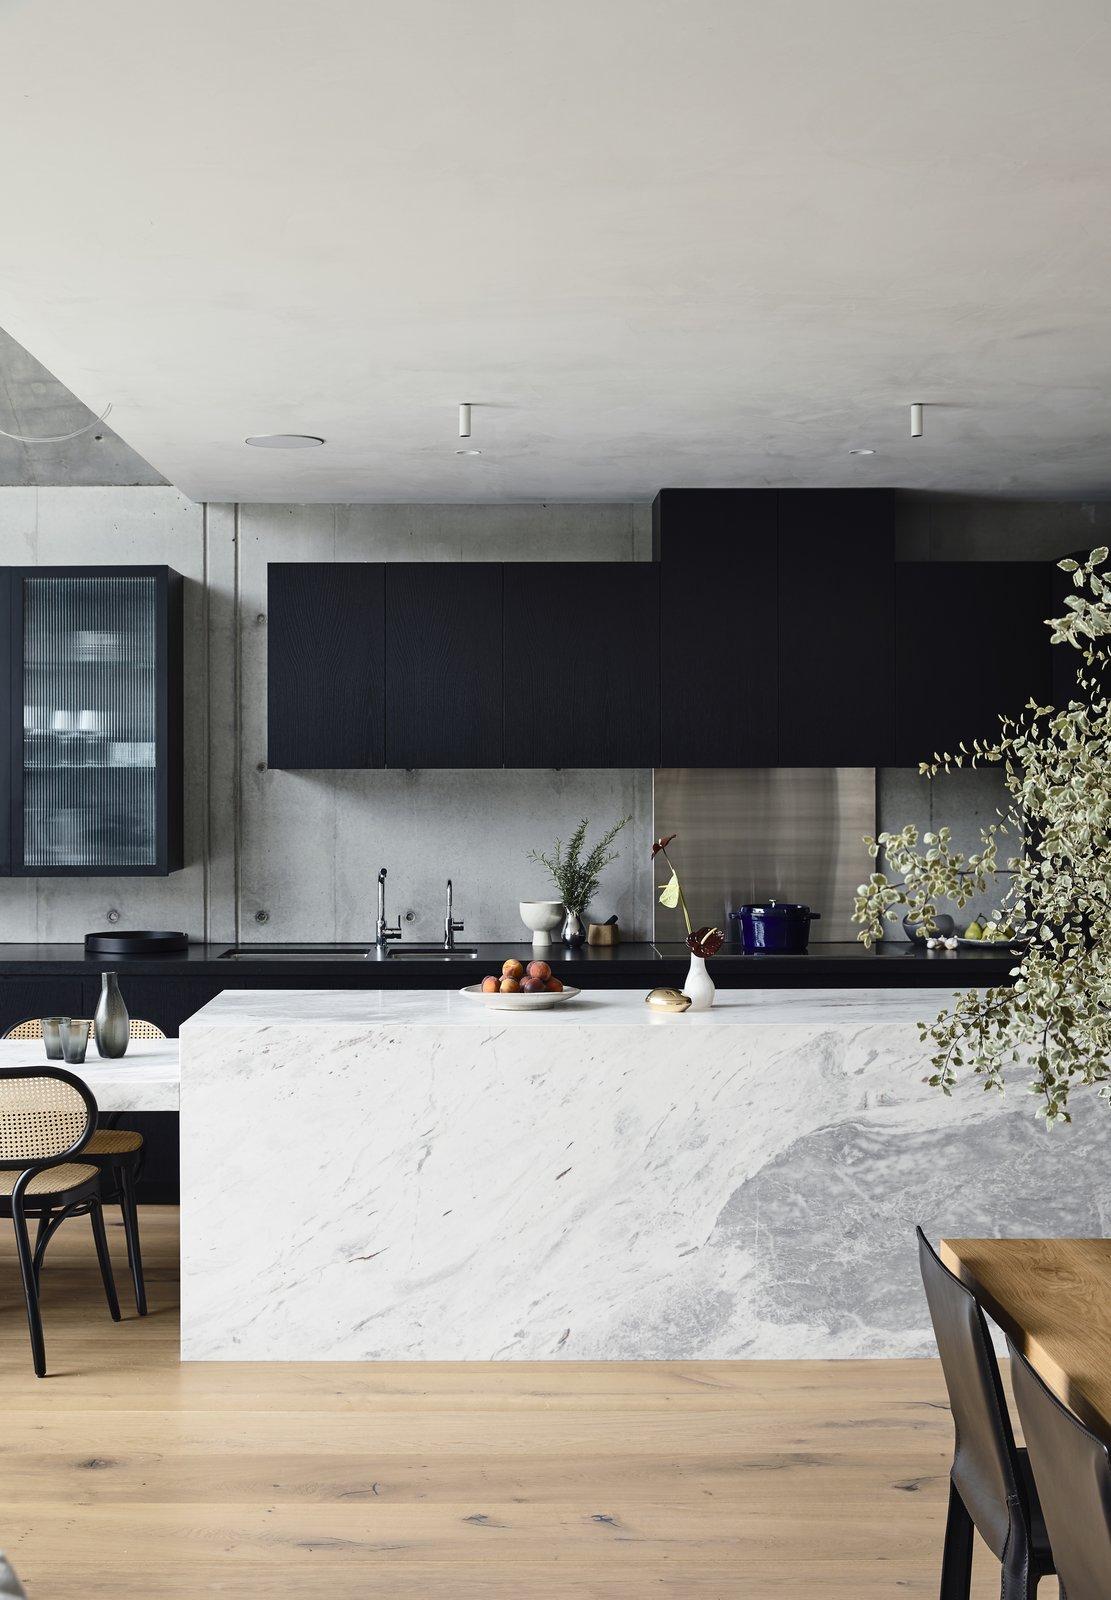 Scandizzo House Kennon+ kitchen great room